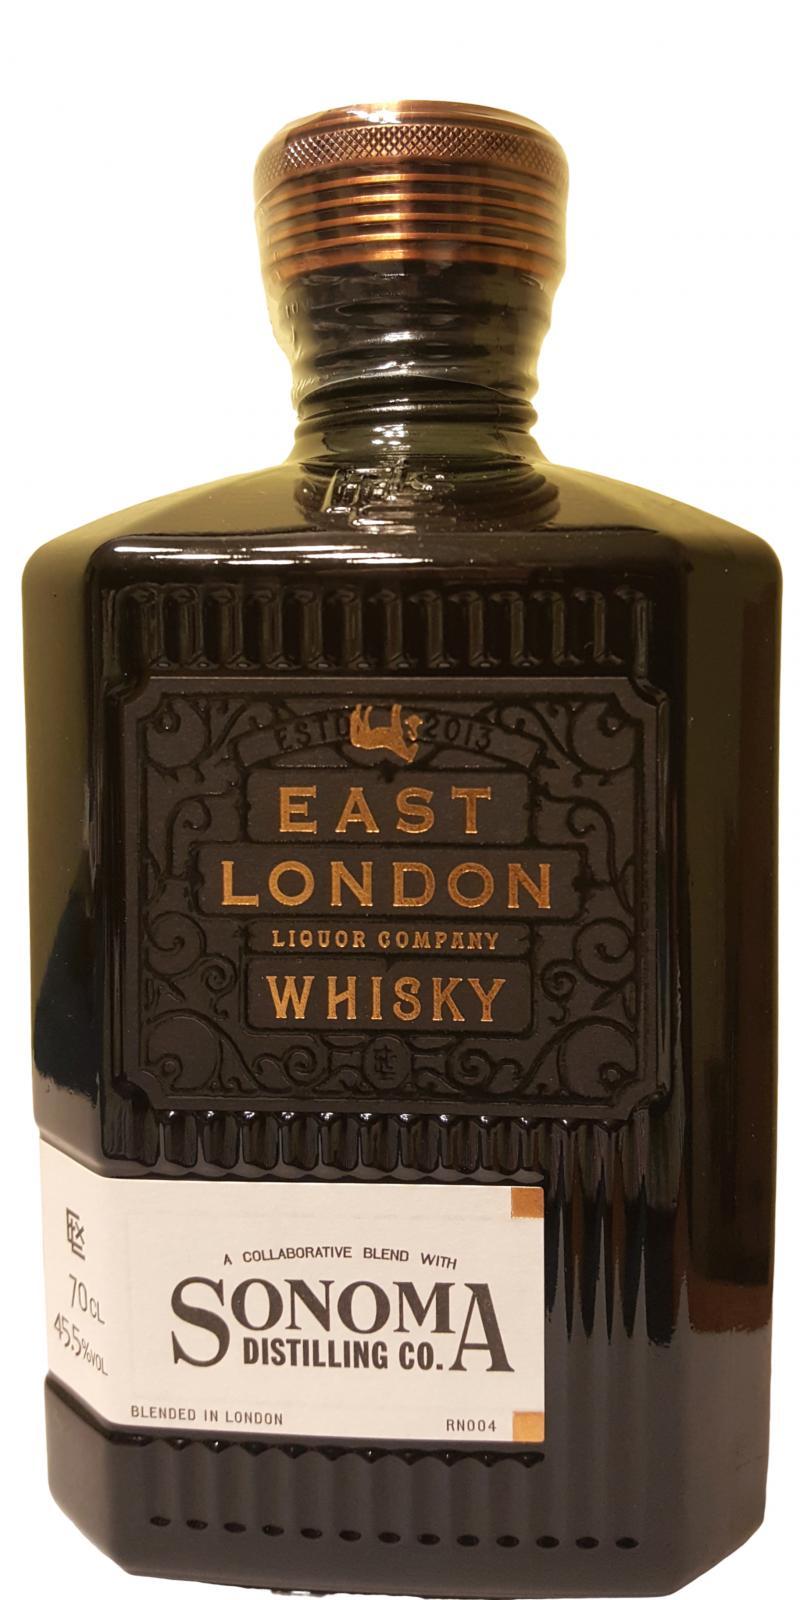 East London ELLC & Sonoma Whisky